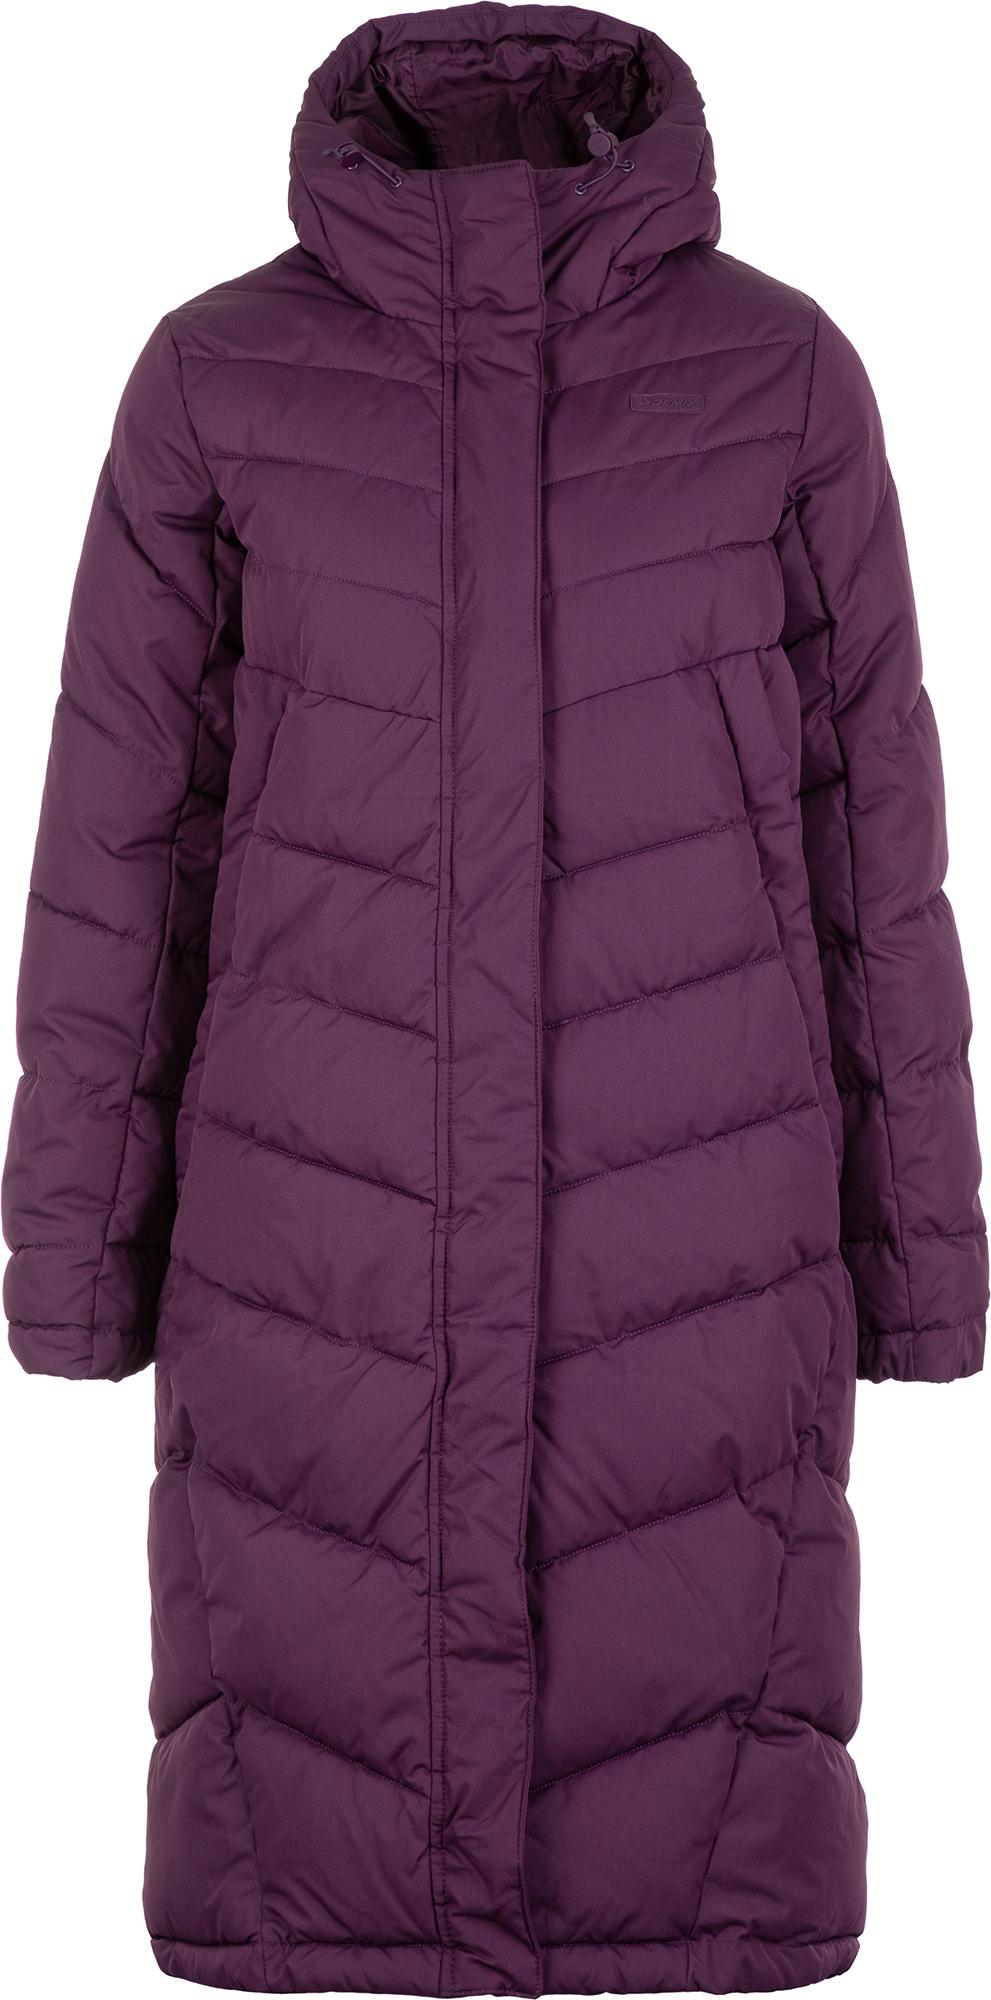 Demix Куртка утепленная женская Demix, размер 52 цены онлайн